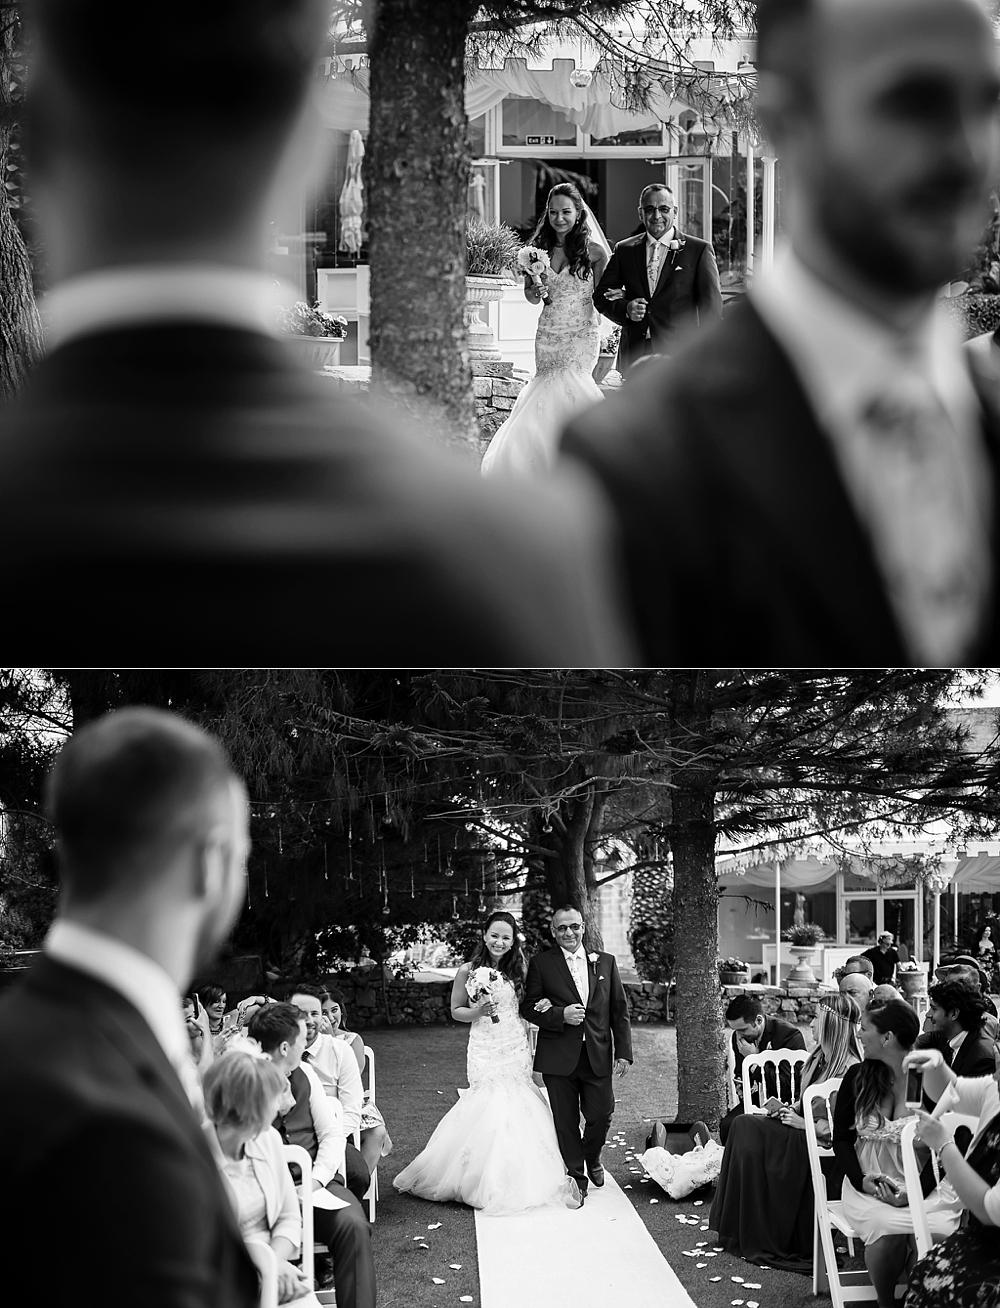 Katharina & Michael - Villa Arrigo - Shane P. Watts Photography - Malta